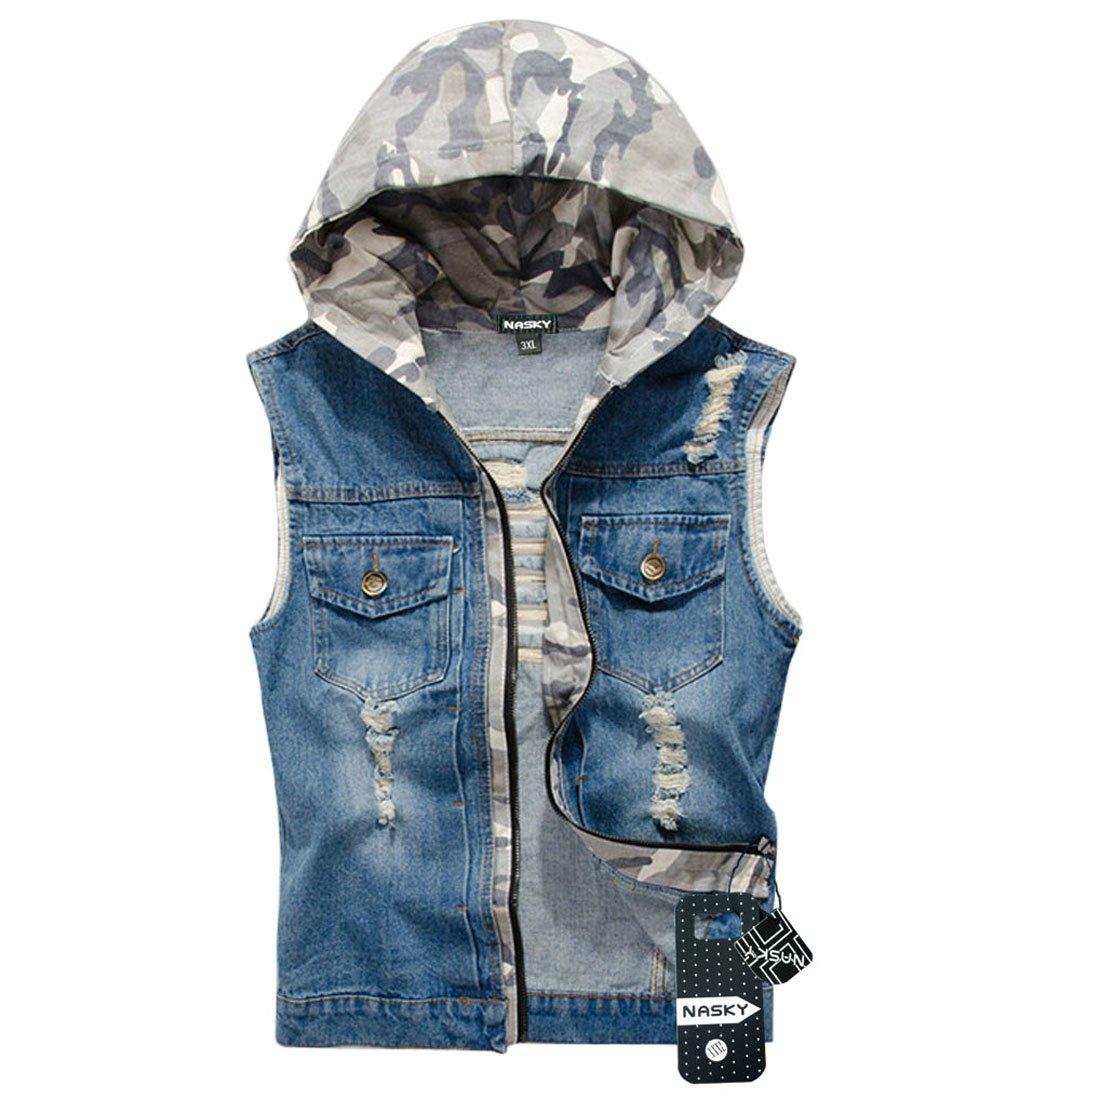 NASKY Men's Retro Ripped Jeans Denim Jacket Vest Hooded Vest Waistcoat Top Medium